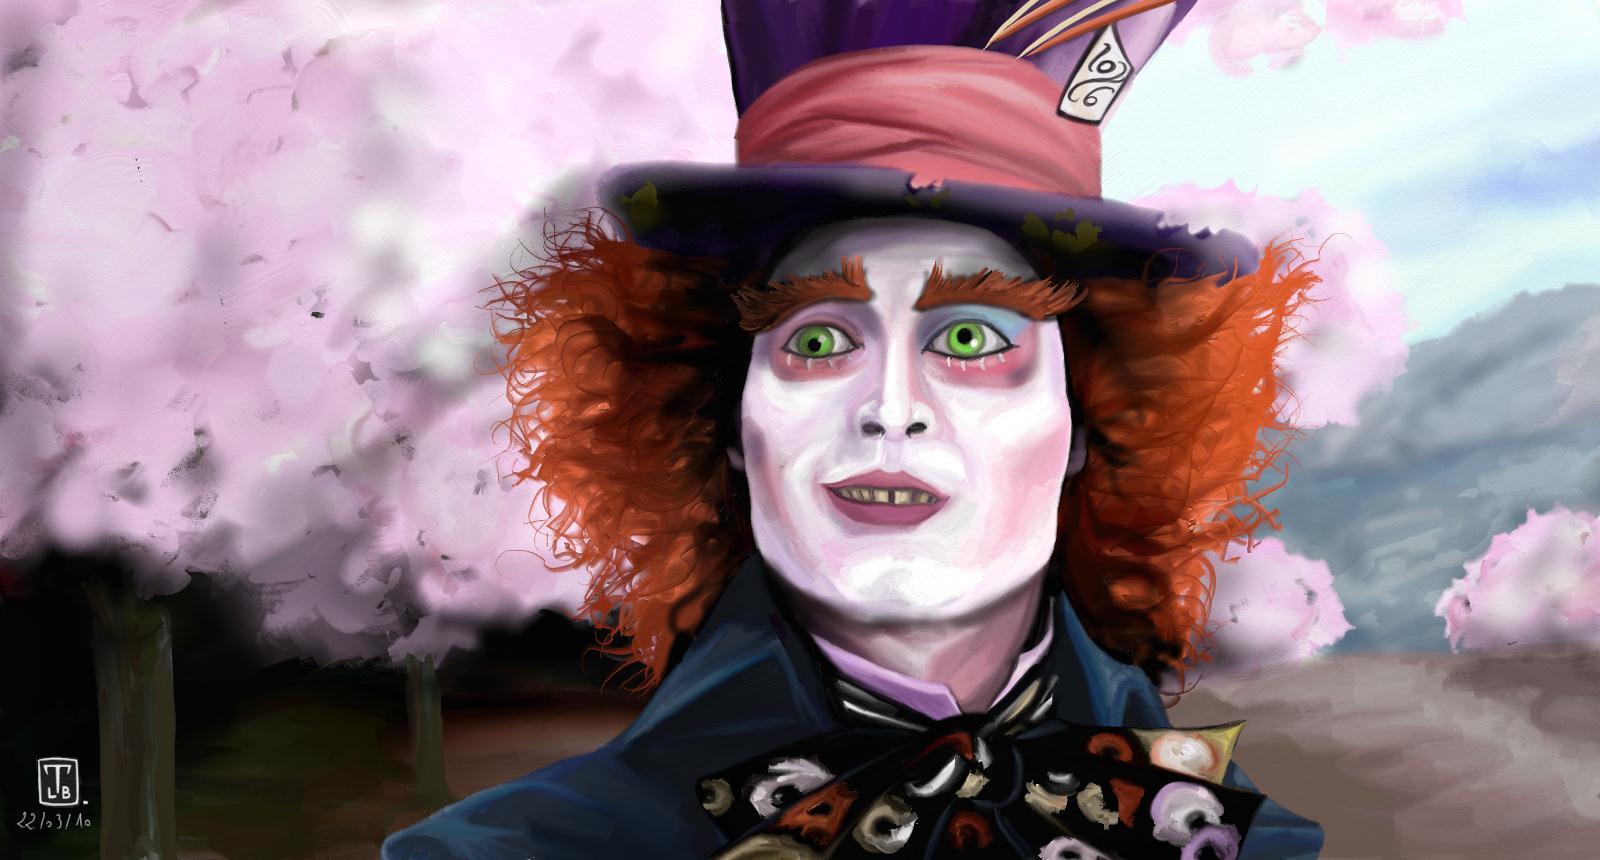 Alice in Wonderland (2010) Wallpaper: Mad Hatter Wallpaper!